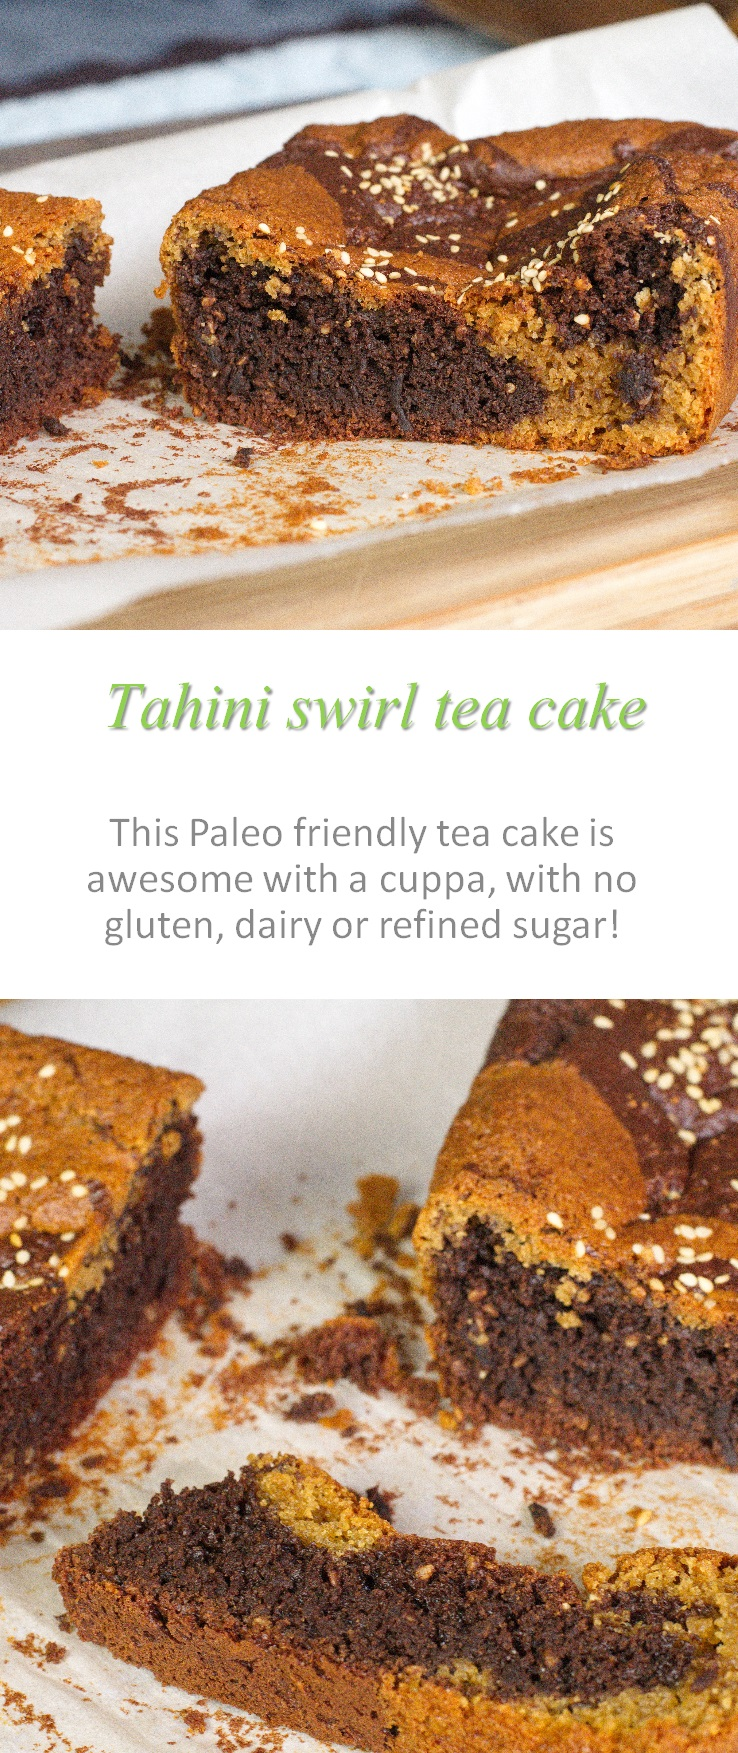 A nutty, seedy taste for this tahini swirl tea cake - the perfect accompaniment to any cuppa, hot or cold! #tahini #teacake #paleo #cookathome #glutenfree #dairyfree